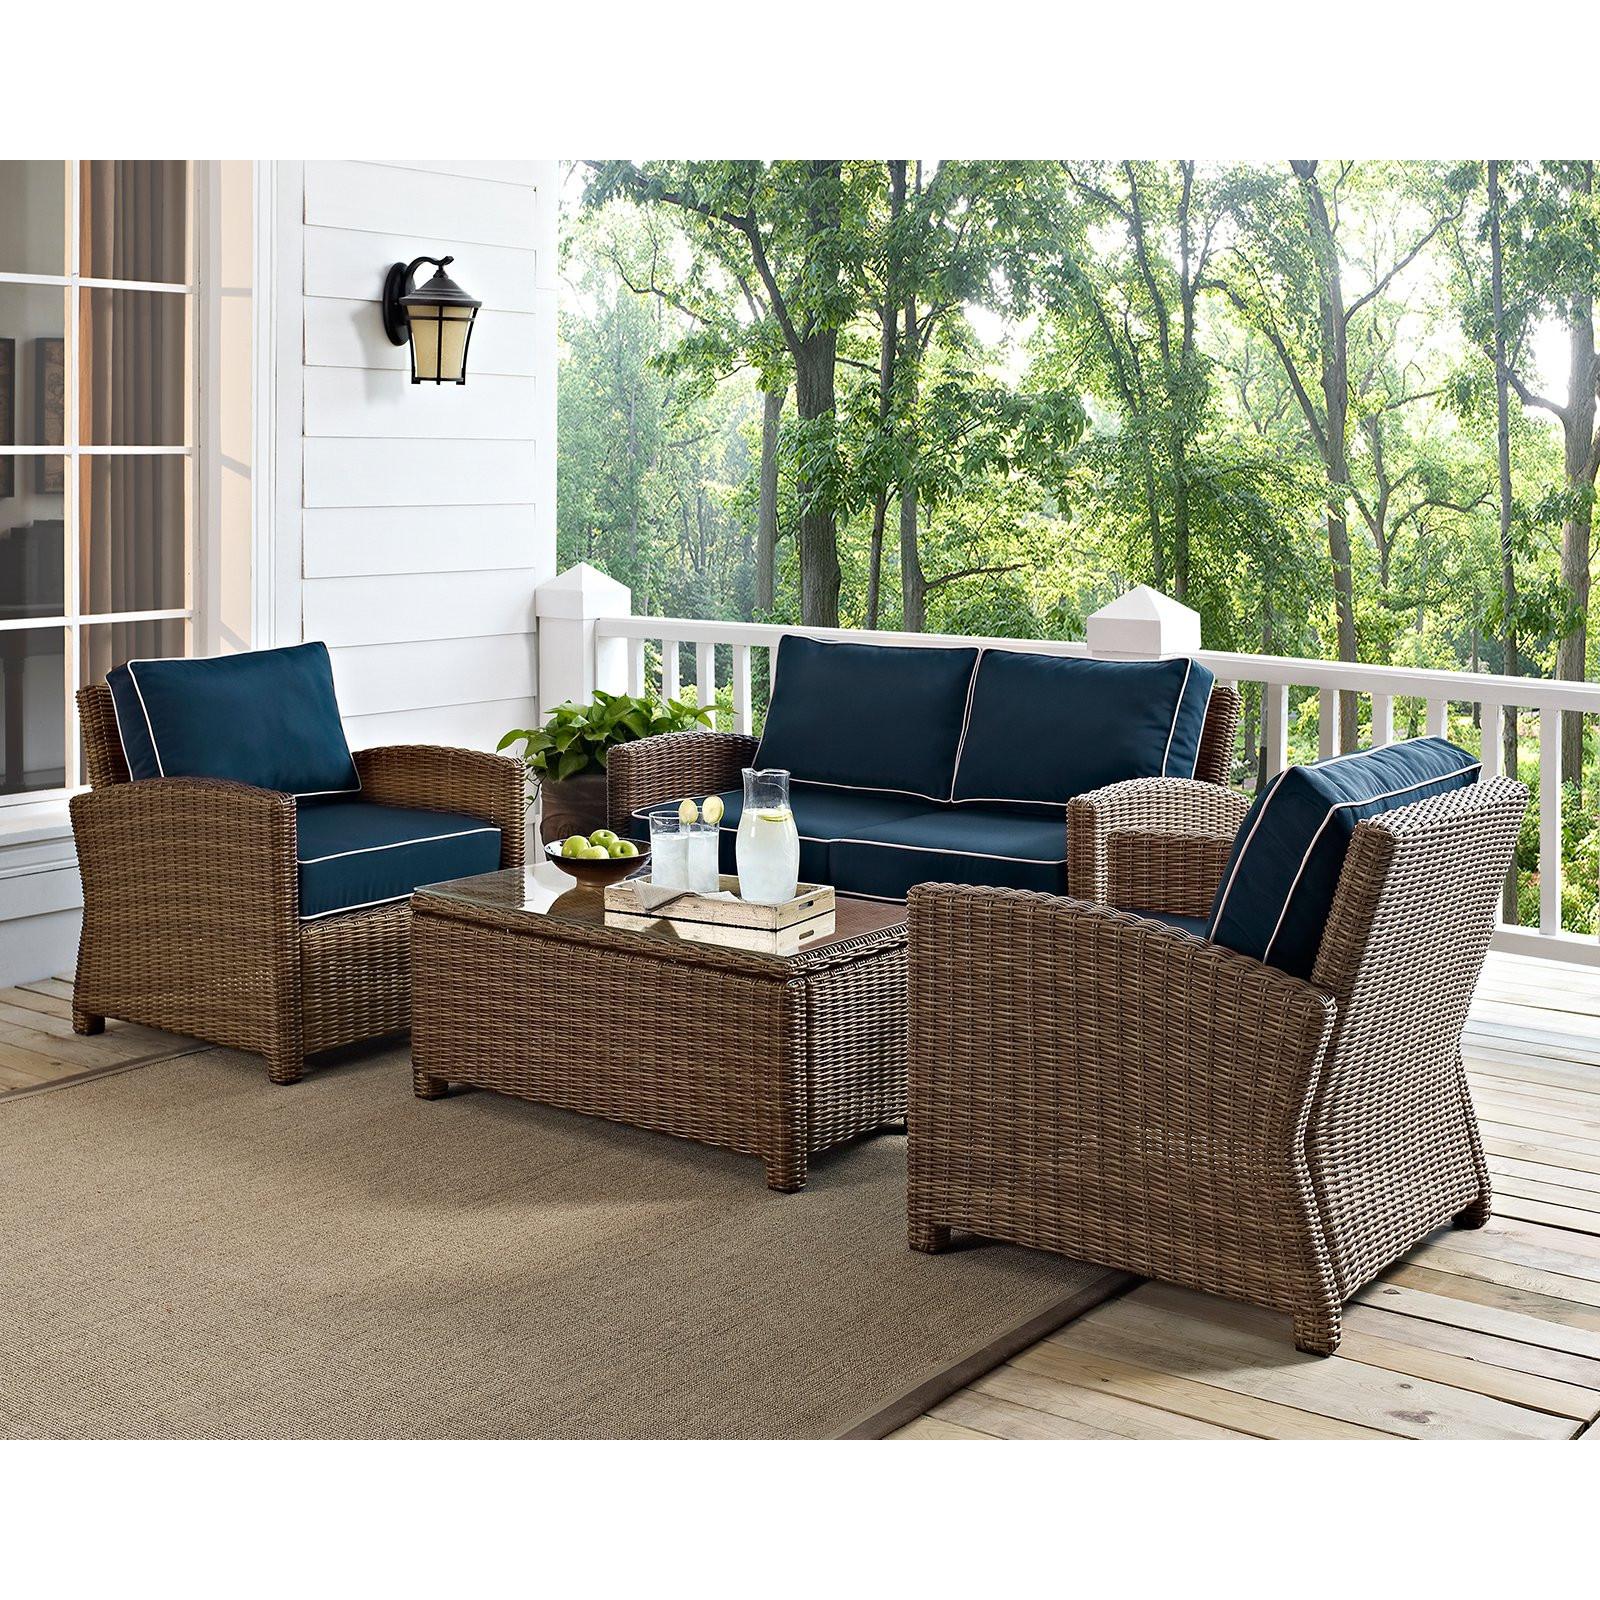 Best ideas about Patio Furniture Set . Save or Pin Crosley Bradenton 4 Piece Outdoor Wicker Conversation Set Now.